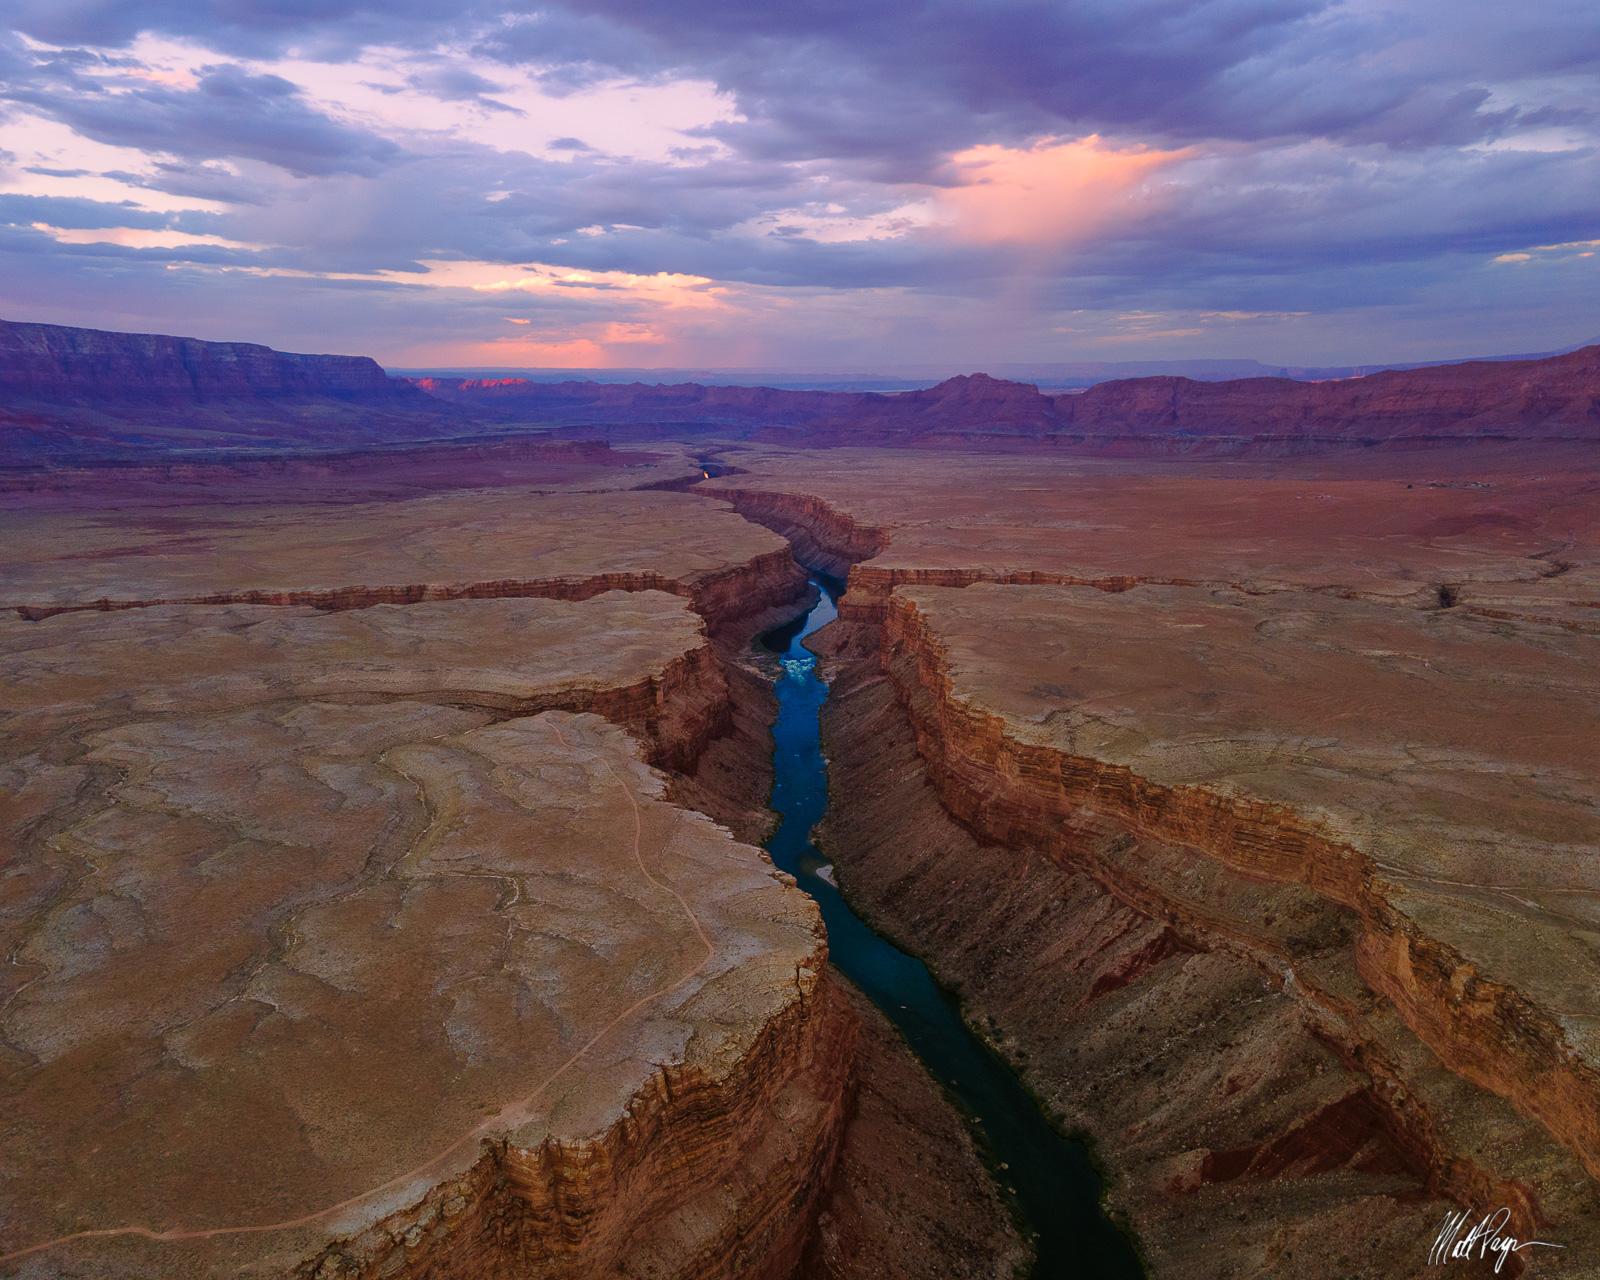 Colorado River, Arizona, Marble Canyon, Landscape Photography, photo